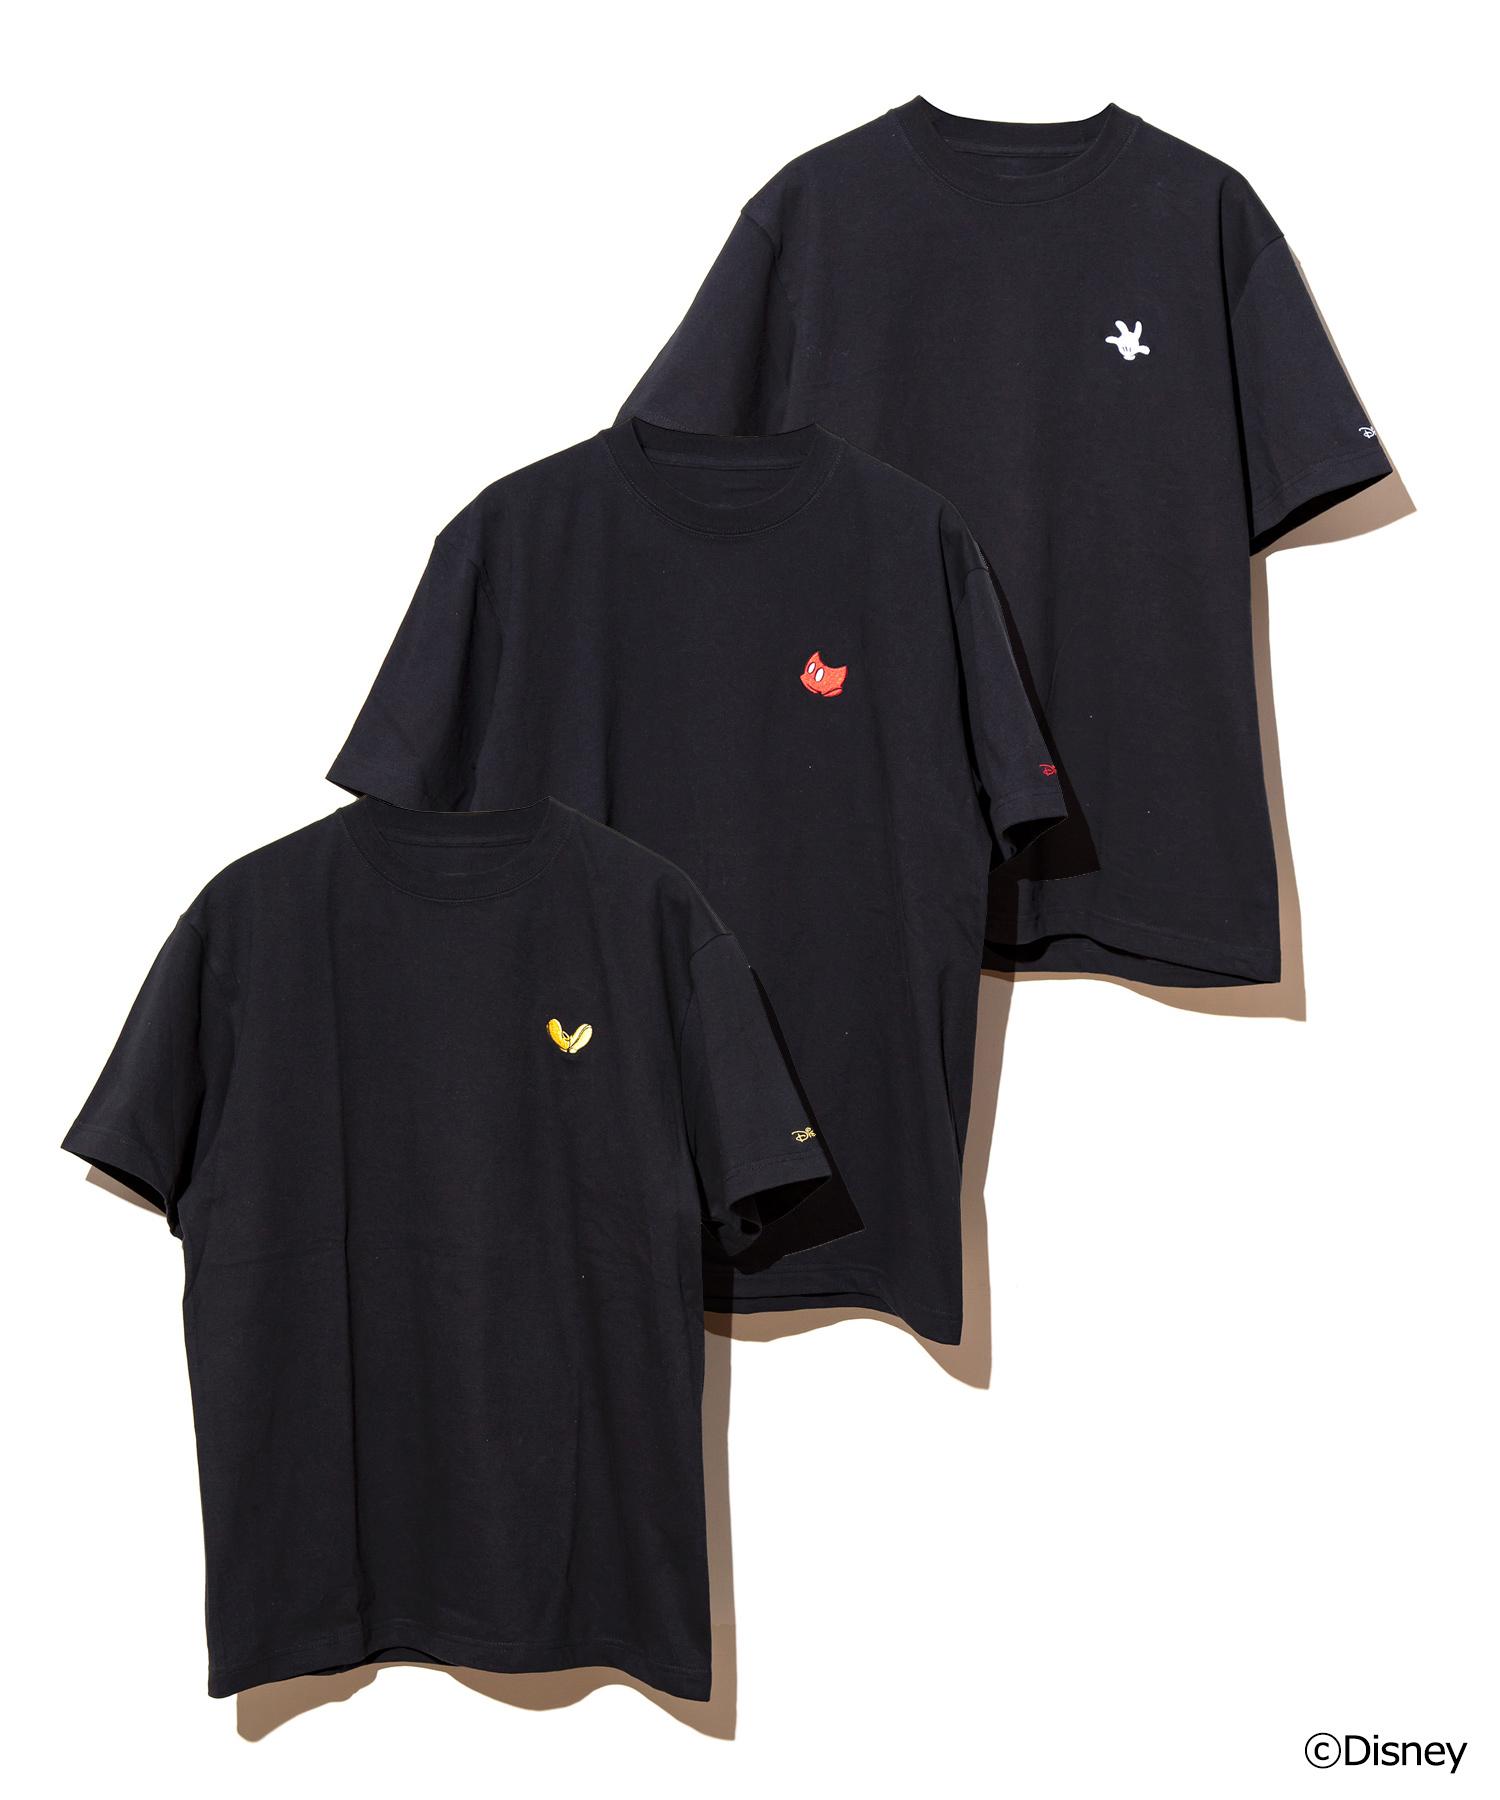 ONEITA / DISNEY 3枚組クルーネックパックTシャツ《ESTNATION EXCLUSIVE》